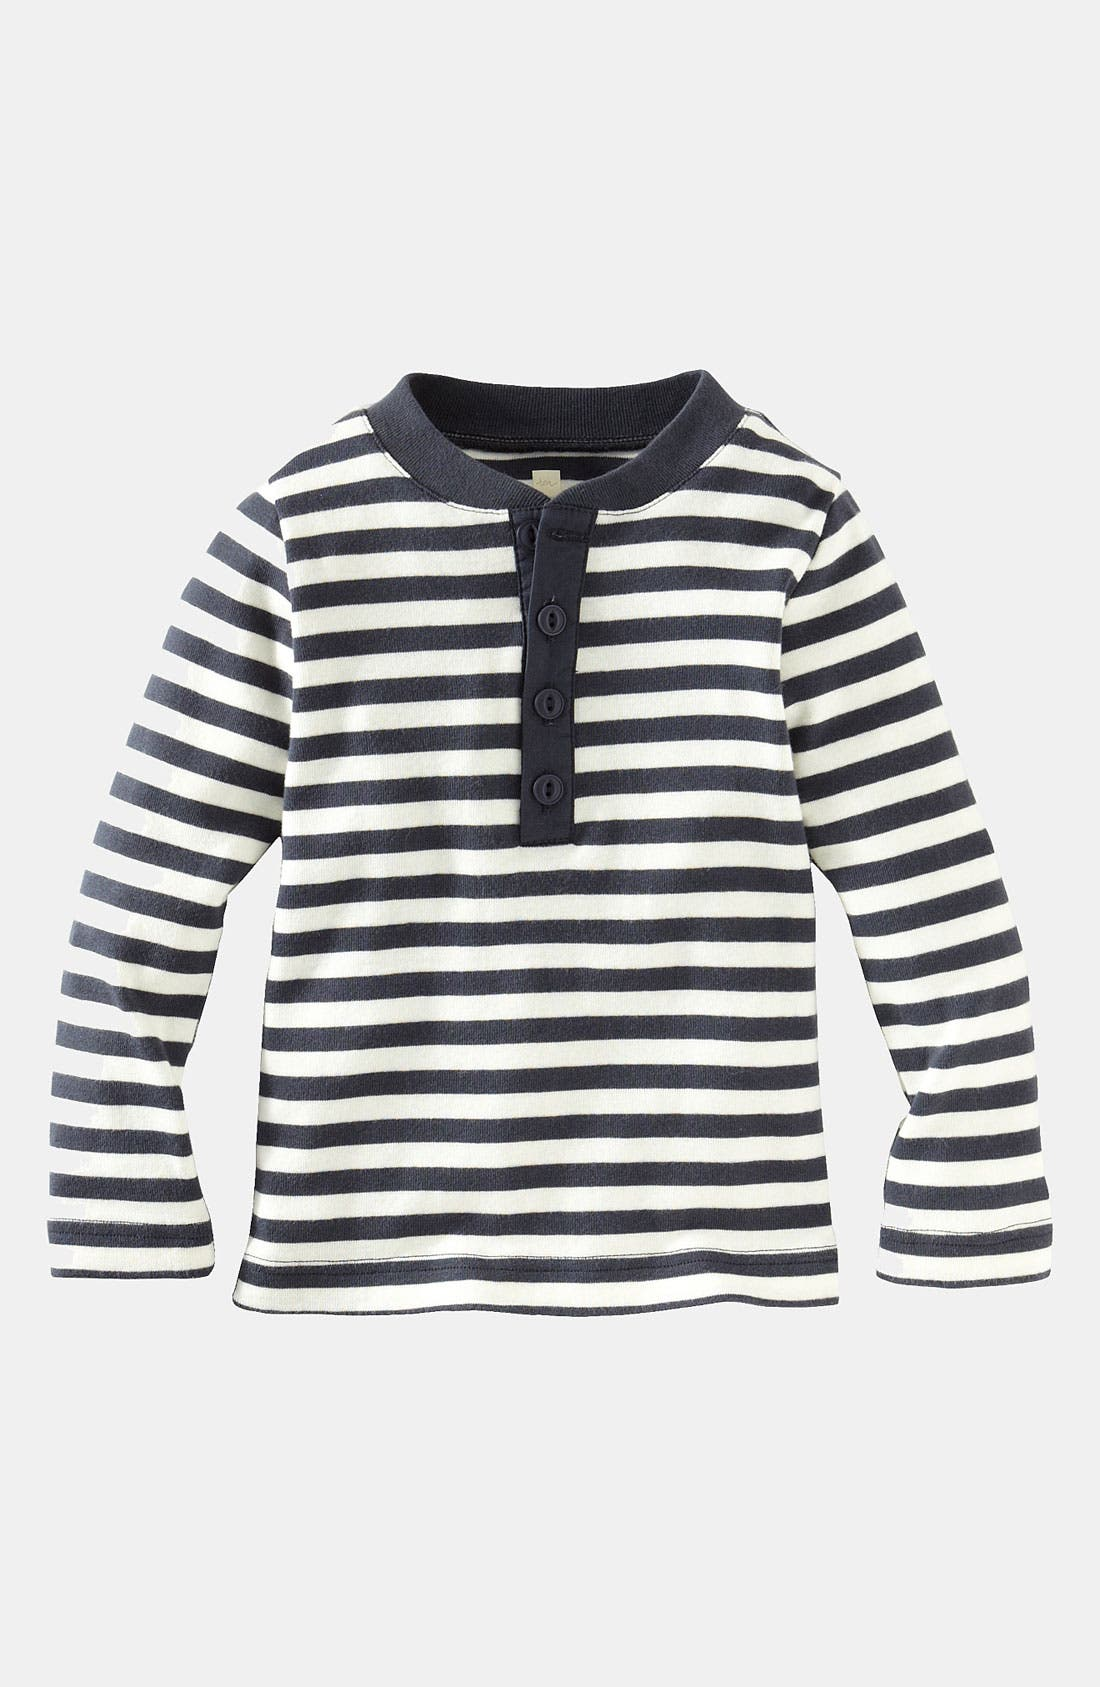 Main Image - Tea Collection Henley Shirt (Toddler)